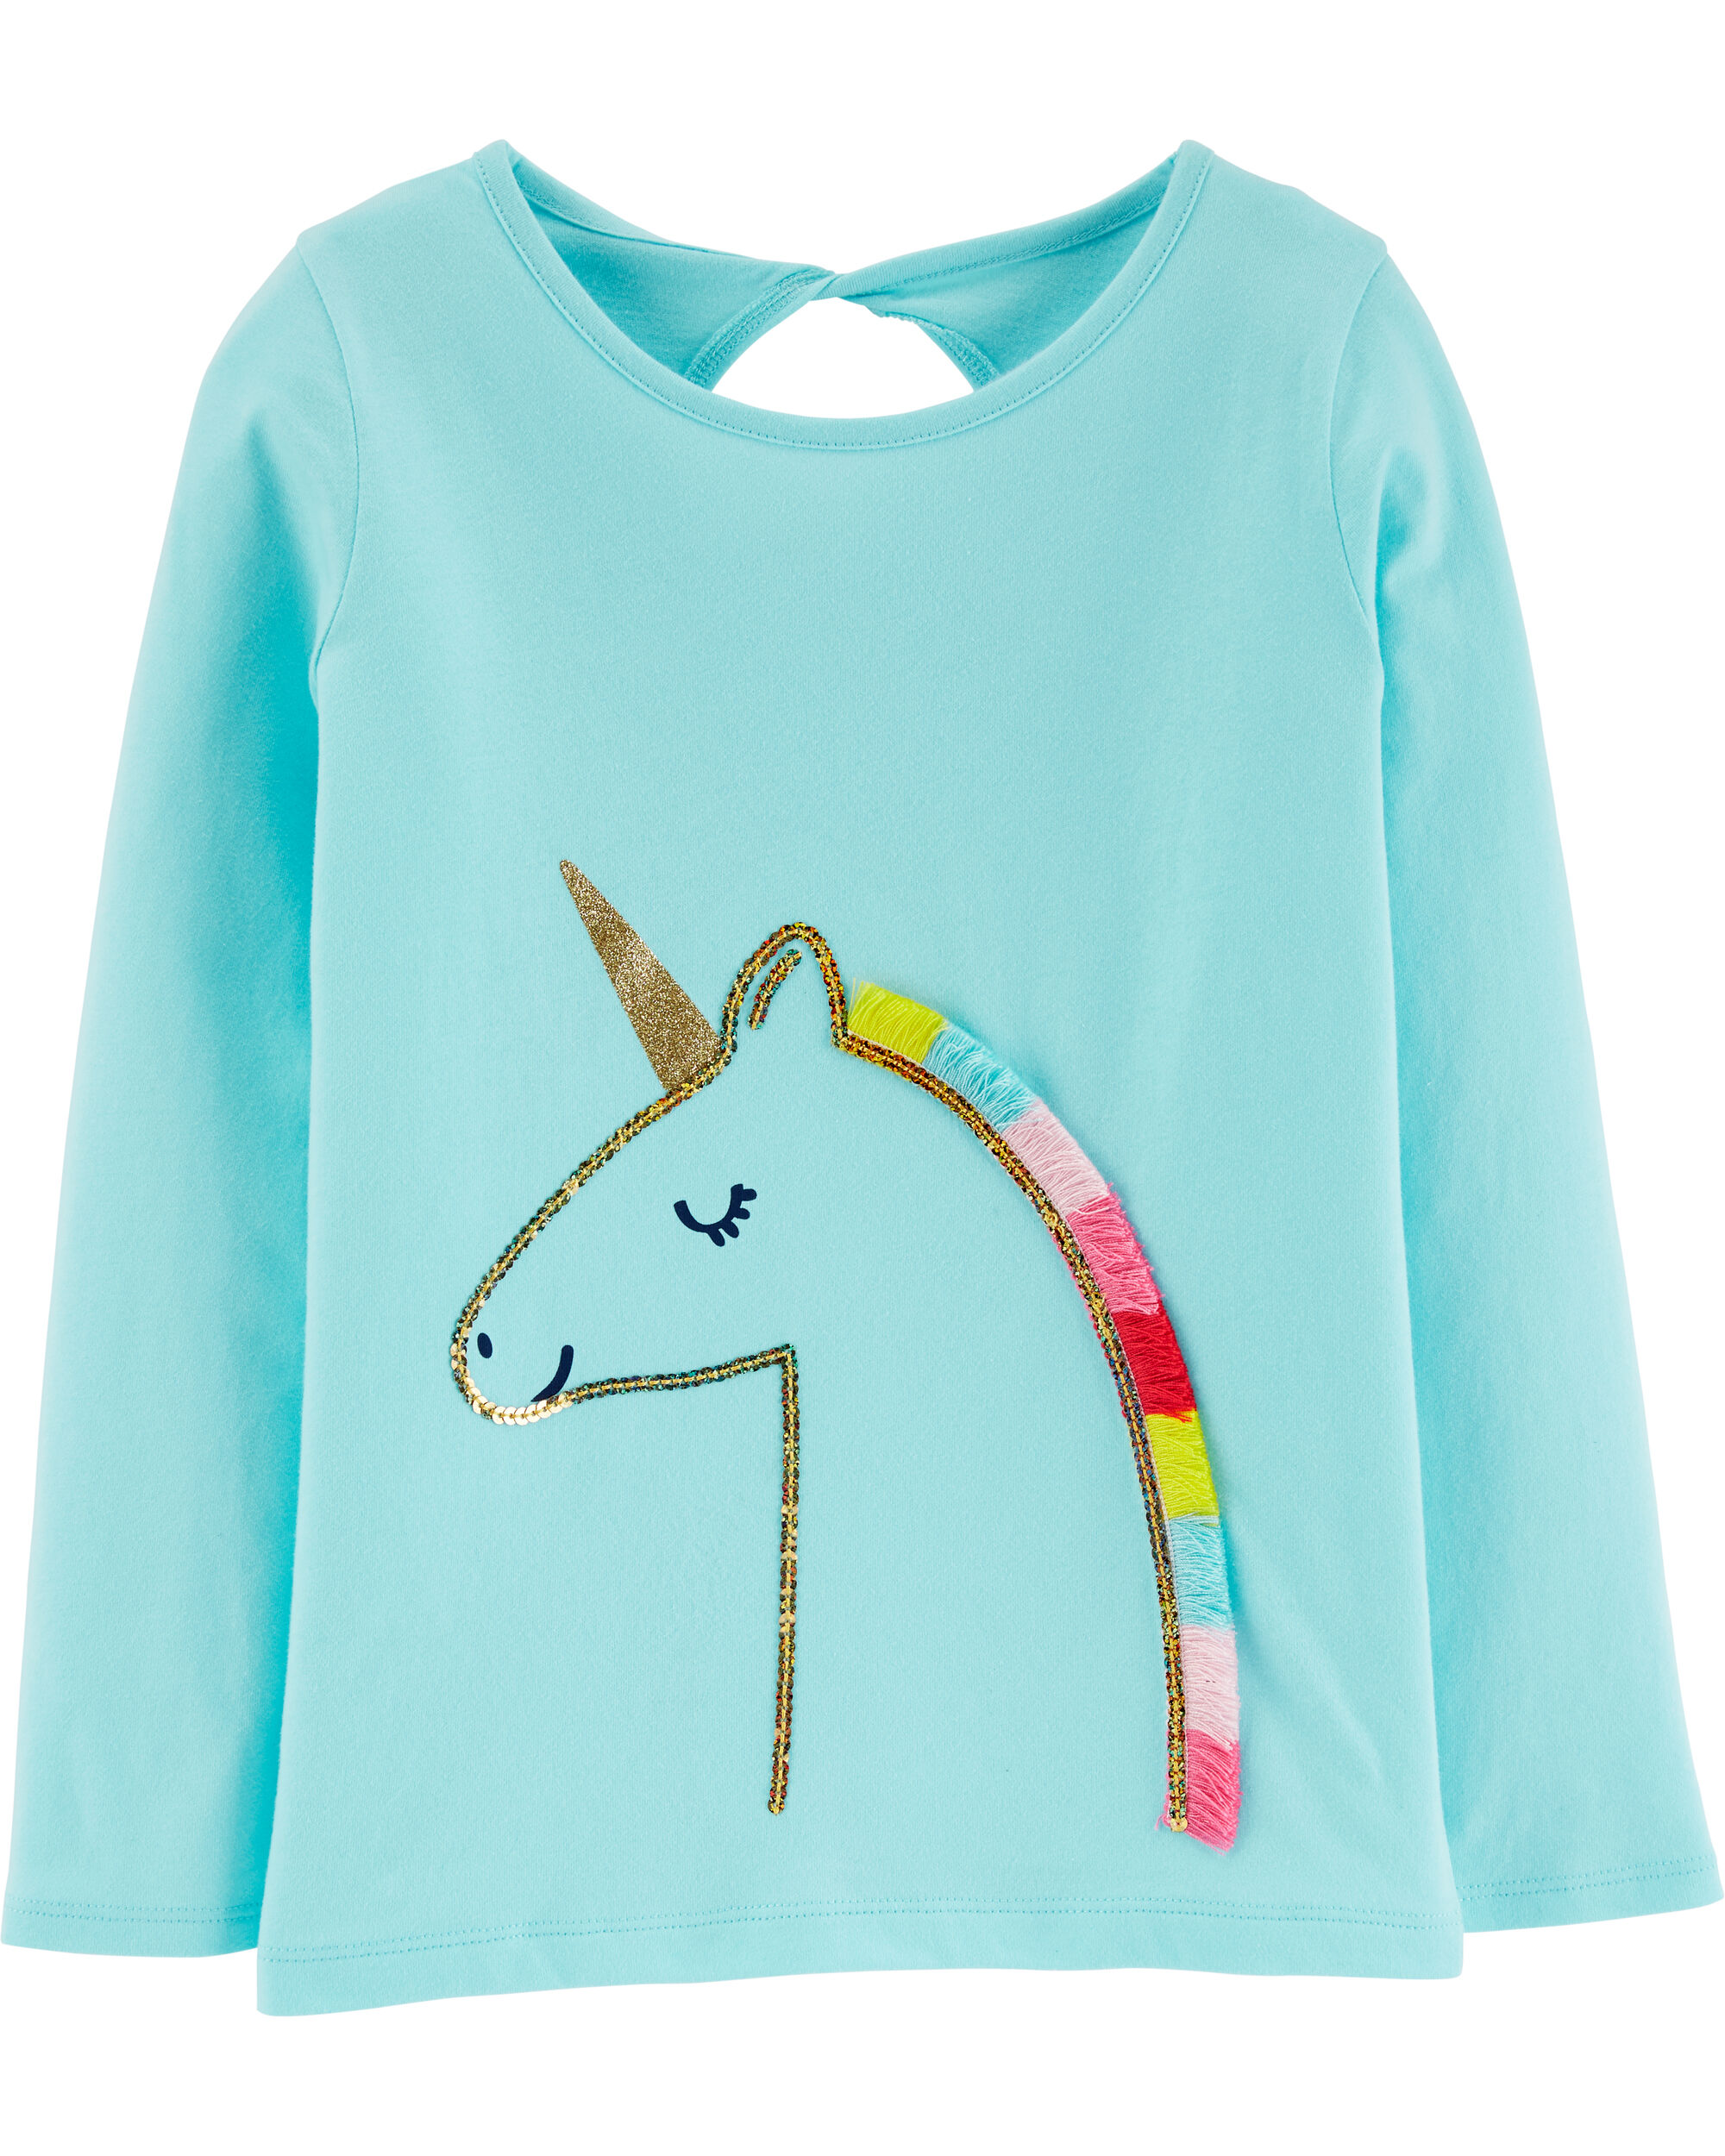 *Clearance*  Sequin Unicorn Jersey Tee